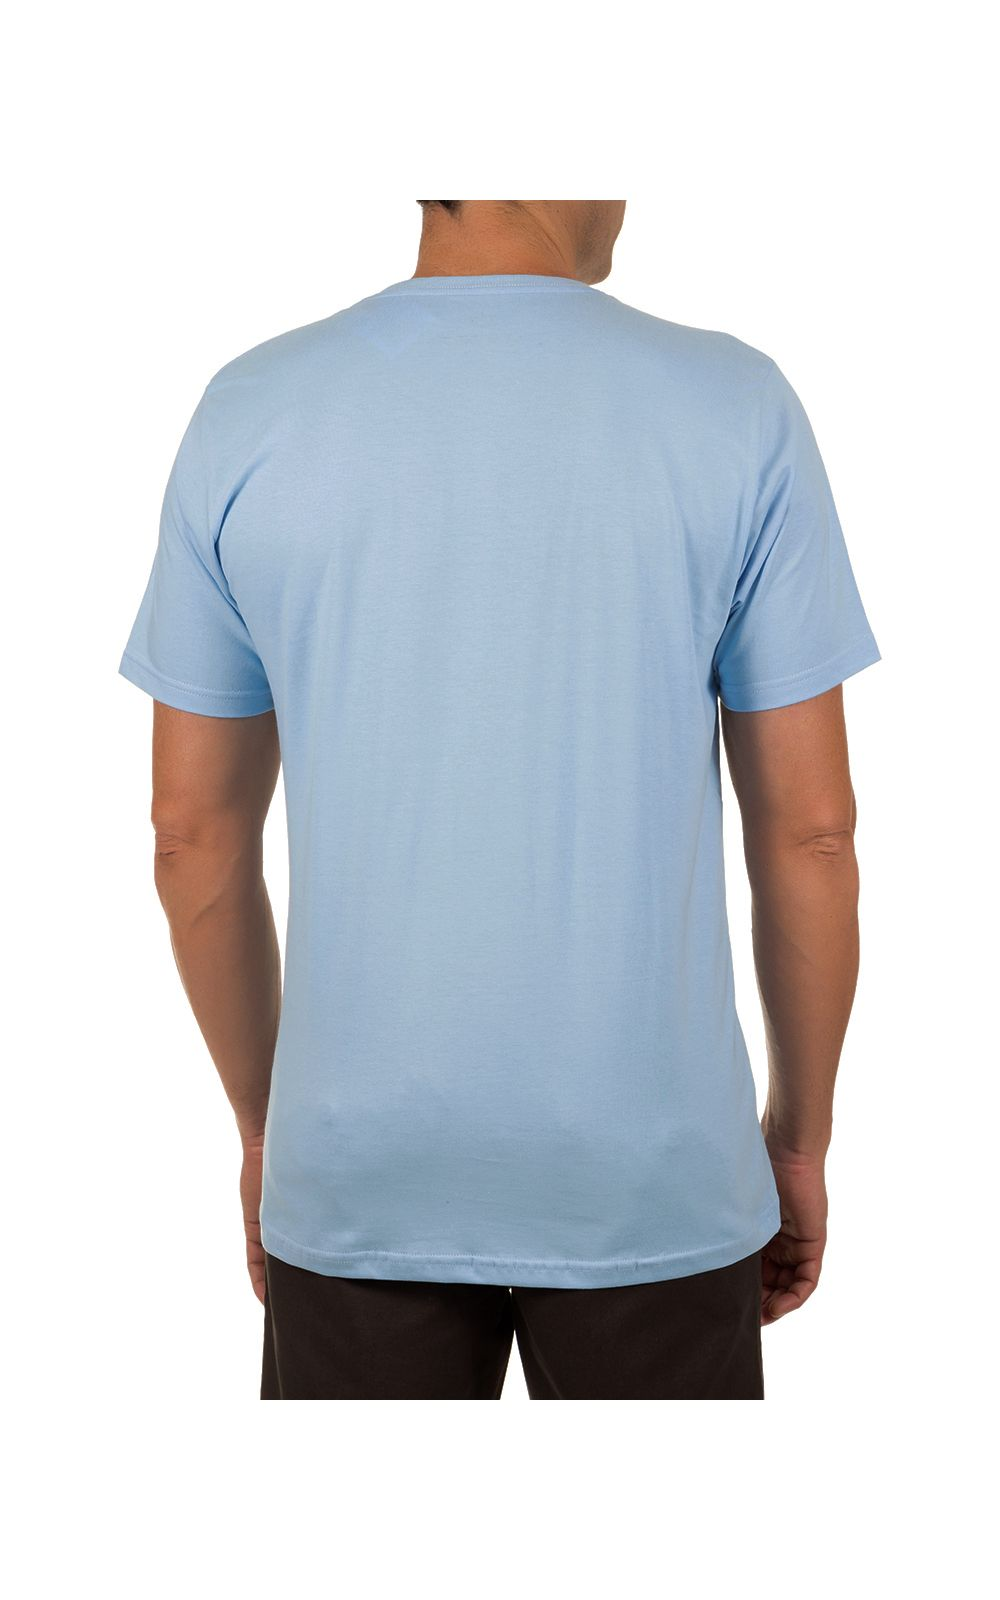 Foto 2 - Camiseta Masculina Azul Claro Lisa